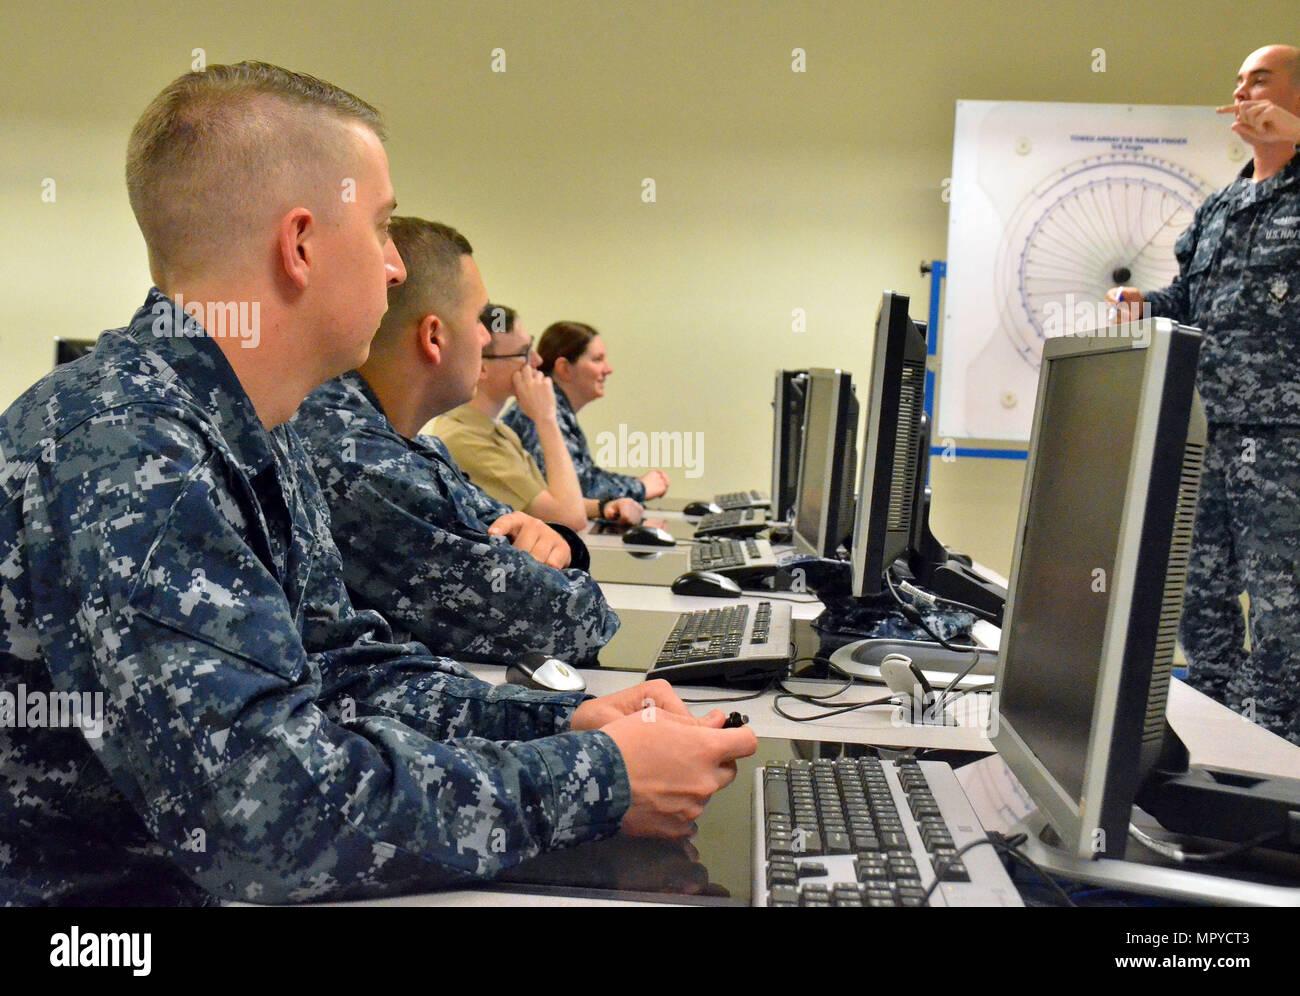 Is navy secf a good job